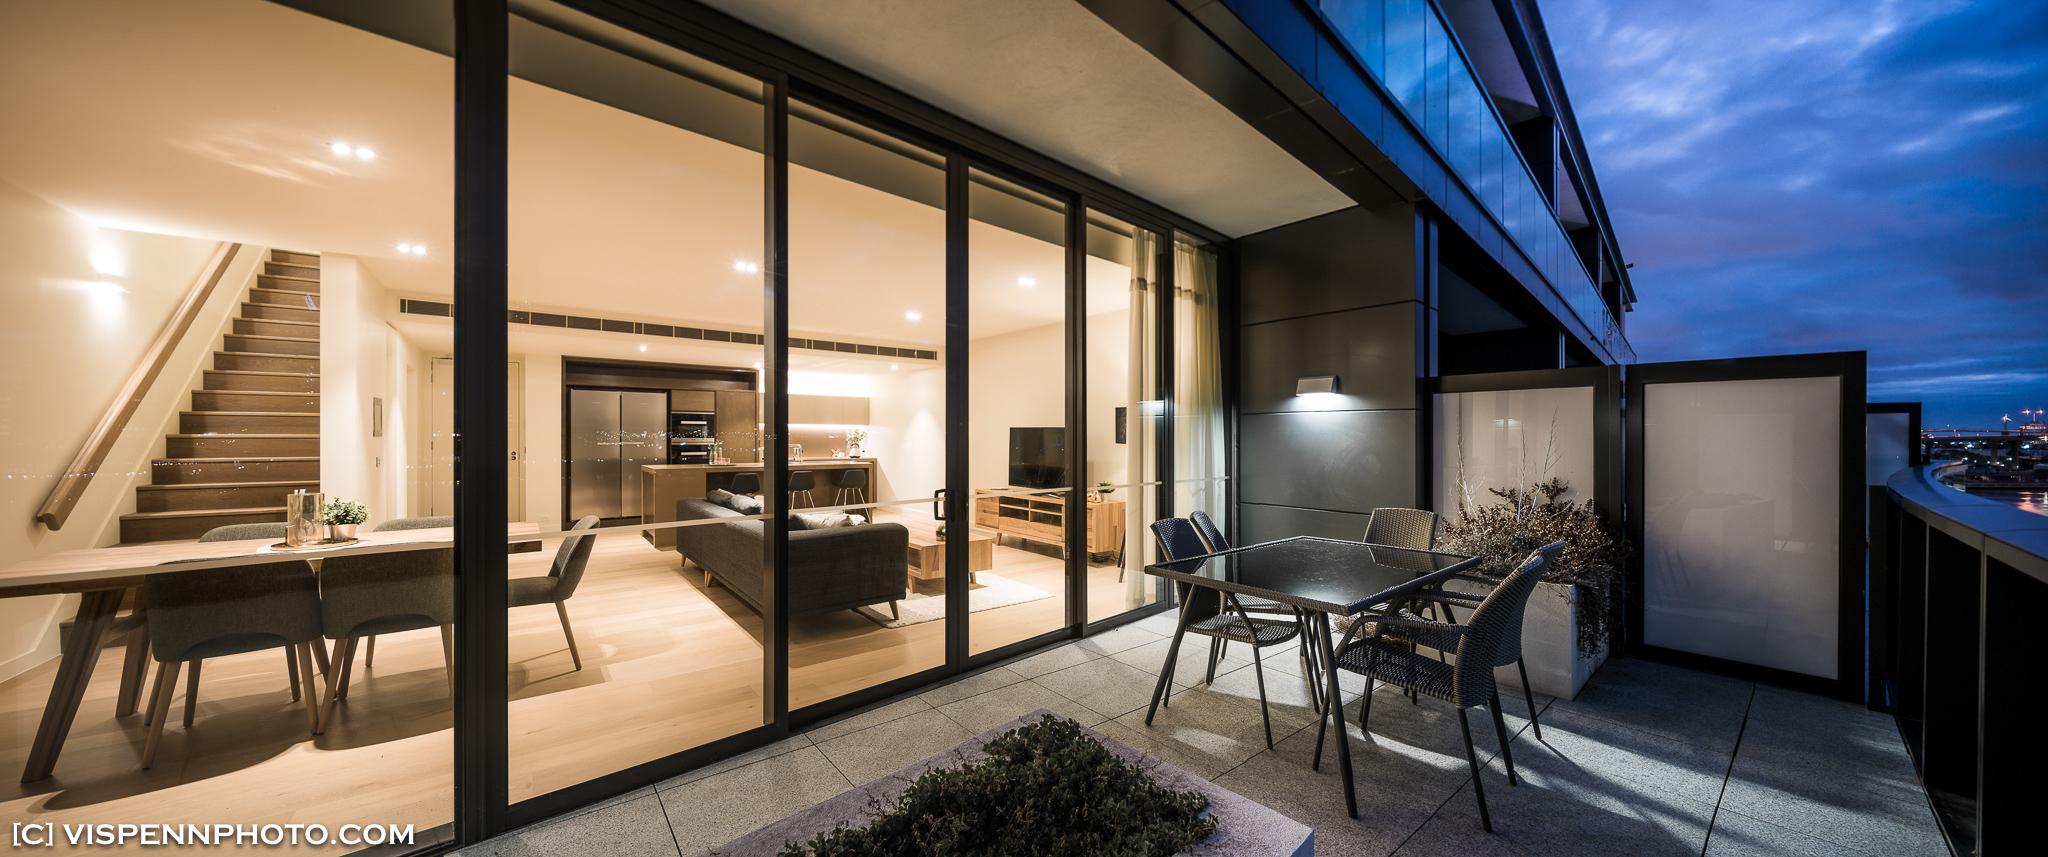 REAL ESTATE INTERIOR Photography Melbourne VISPENN 墨尔本 地产摄影 公寓拍摄 豪宅拍摄 VR远程看房 房产航拍 print 22